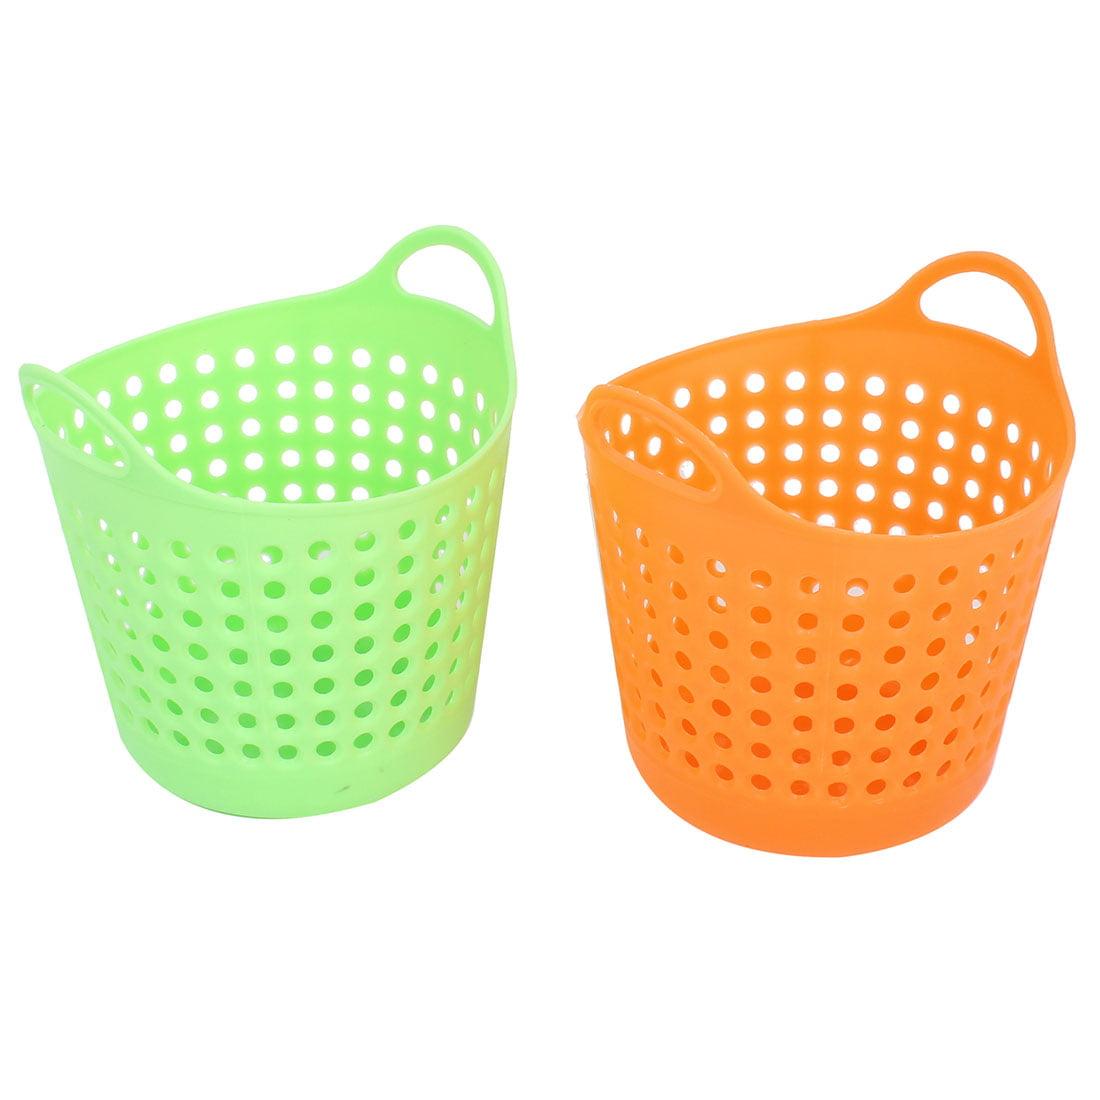 Desktop Green Orange Plastic Storage Basket Container Holder 2 Pcs